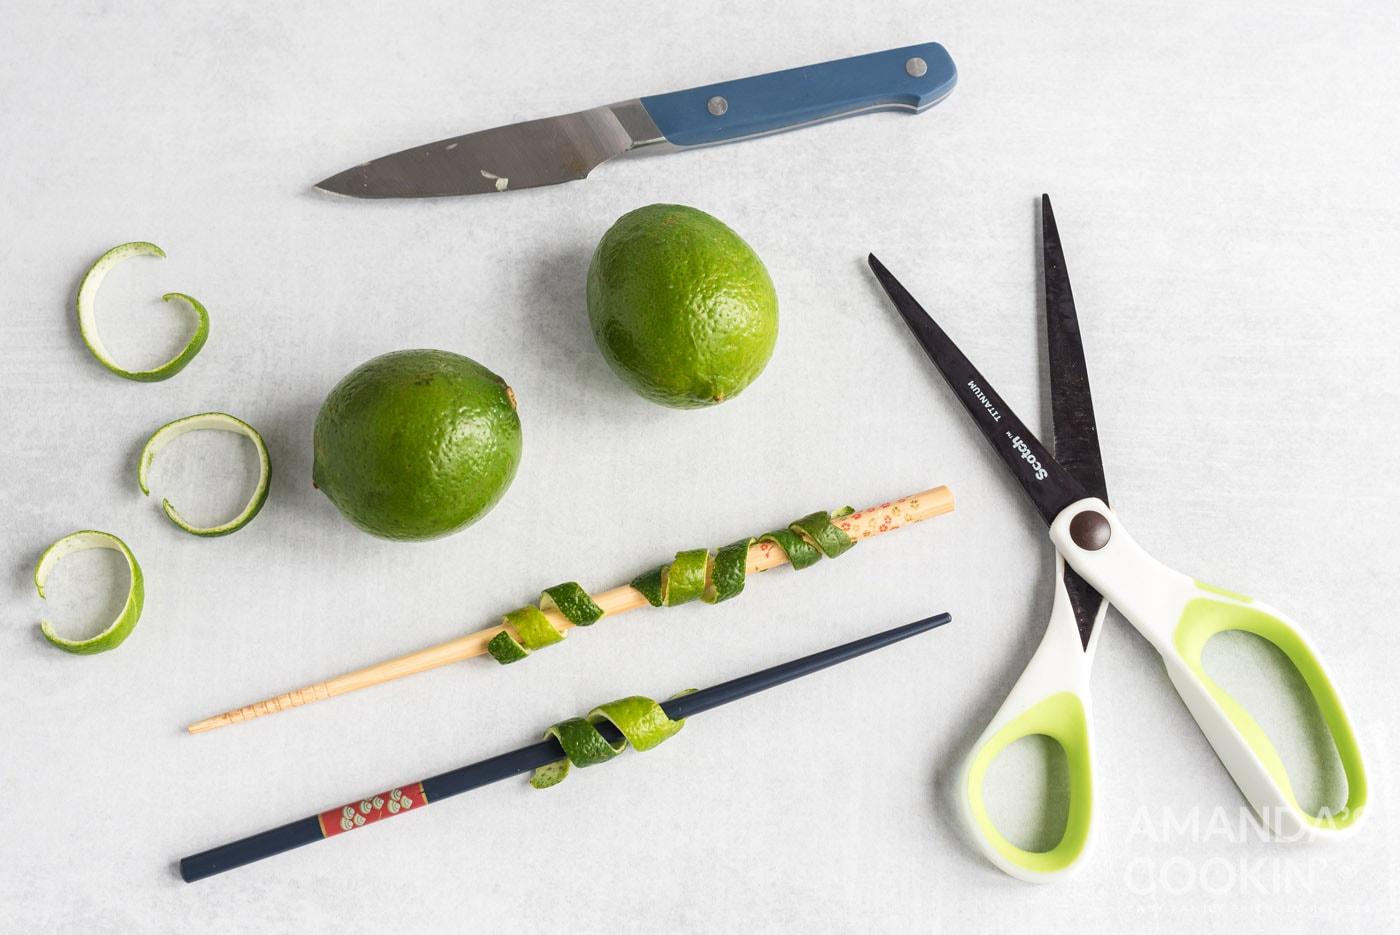 scissors, lime, chopstick